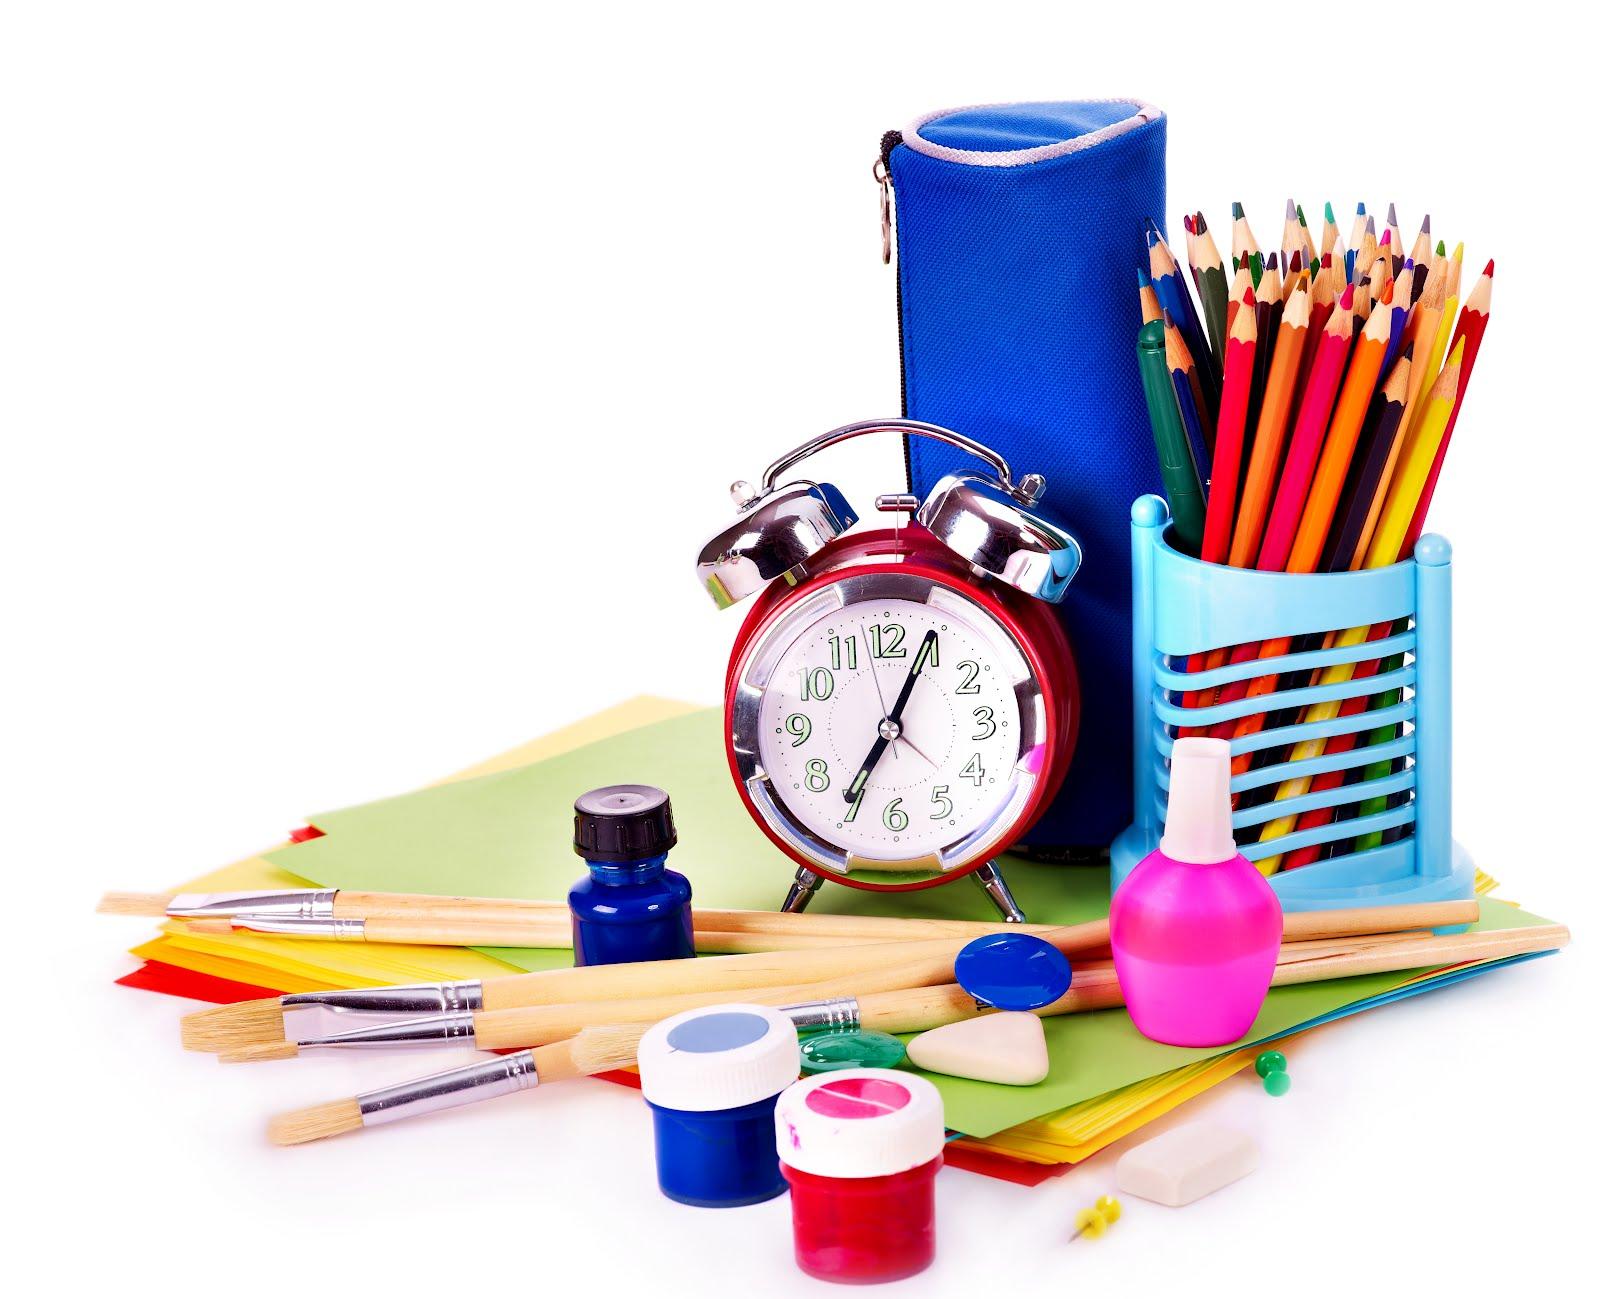 http://4.bp.blogspot.com/-47n1mV3QeNg/T8kPaY0XJvI/AAAAAAAA6Is/dWqfgMHGy-E/s1600/utiles-escolares-lapices-colores-reloj-regreso-escuela.jpg